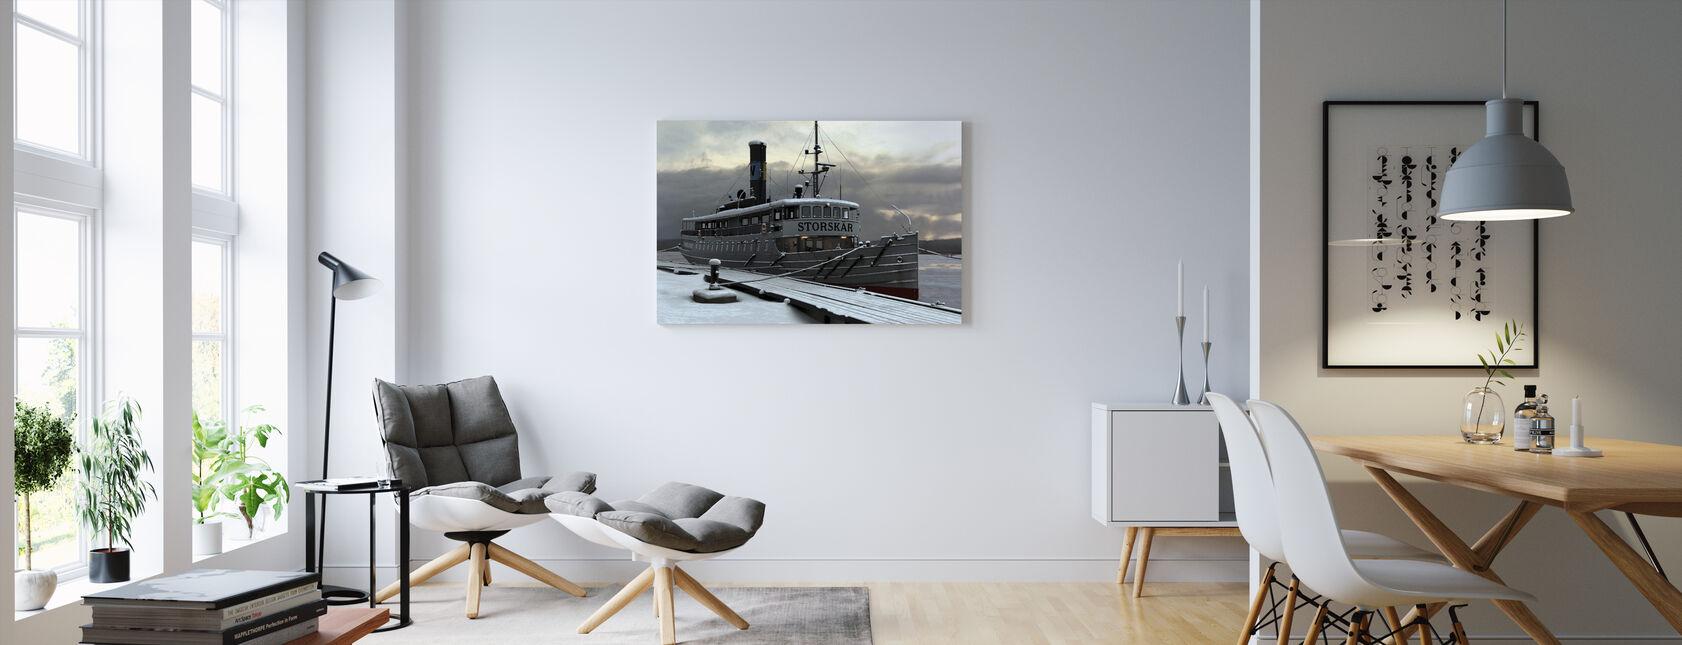 Waxholm Boat - Canvastavla - Vardagsrum